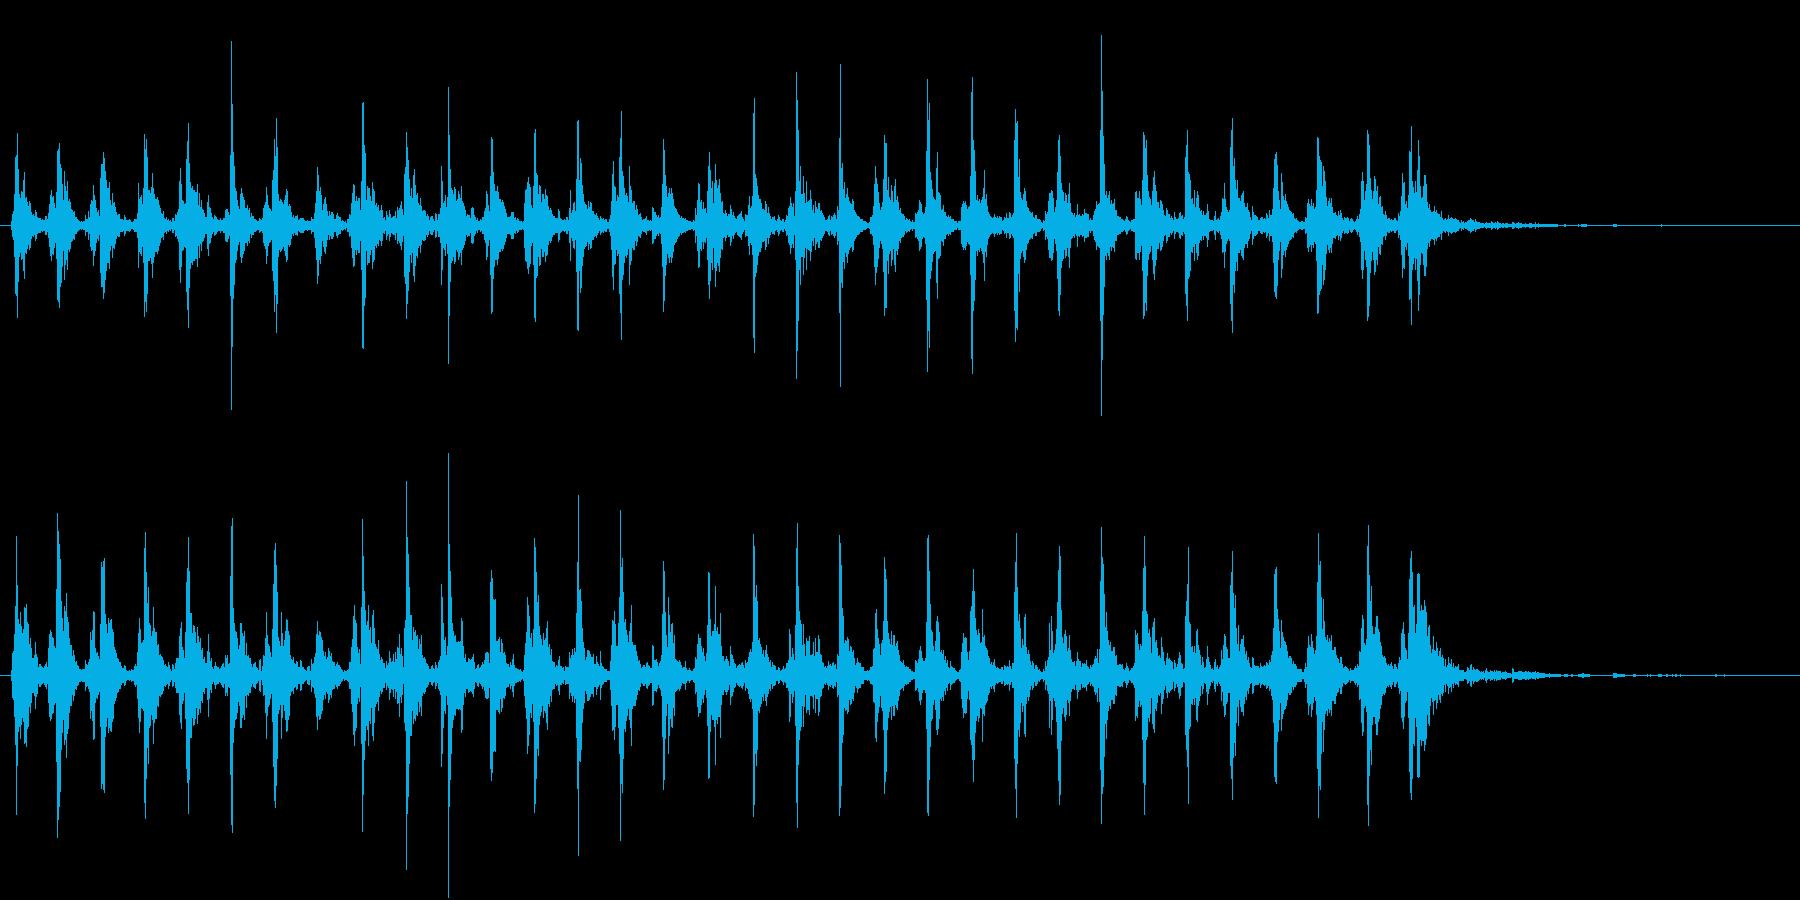 Xmasに最適トナカイベルのループ音08の再生済みの波形